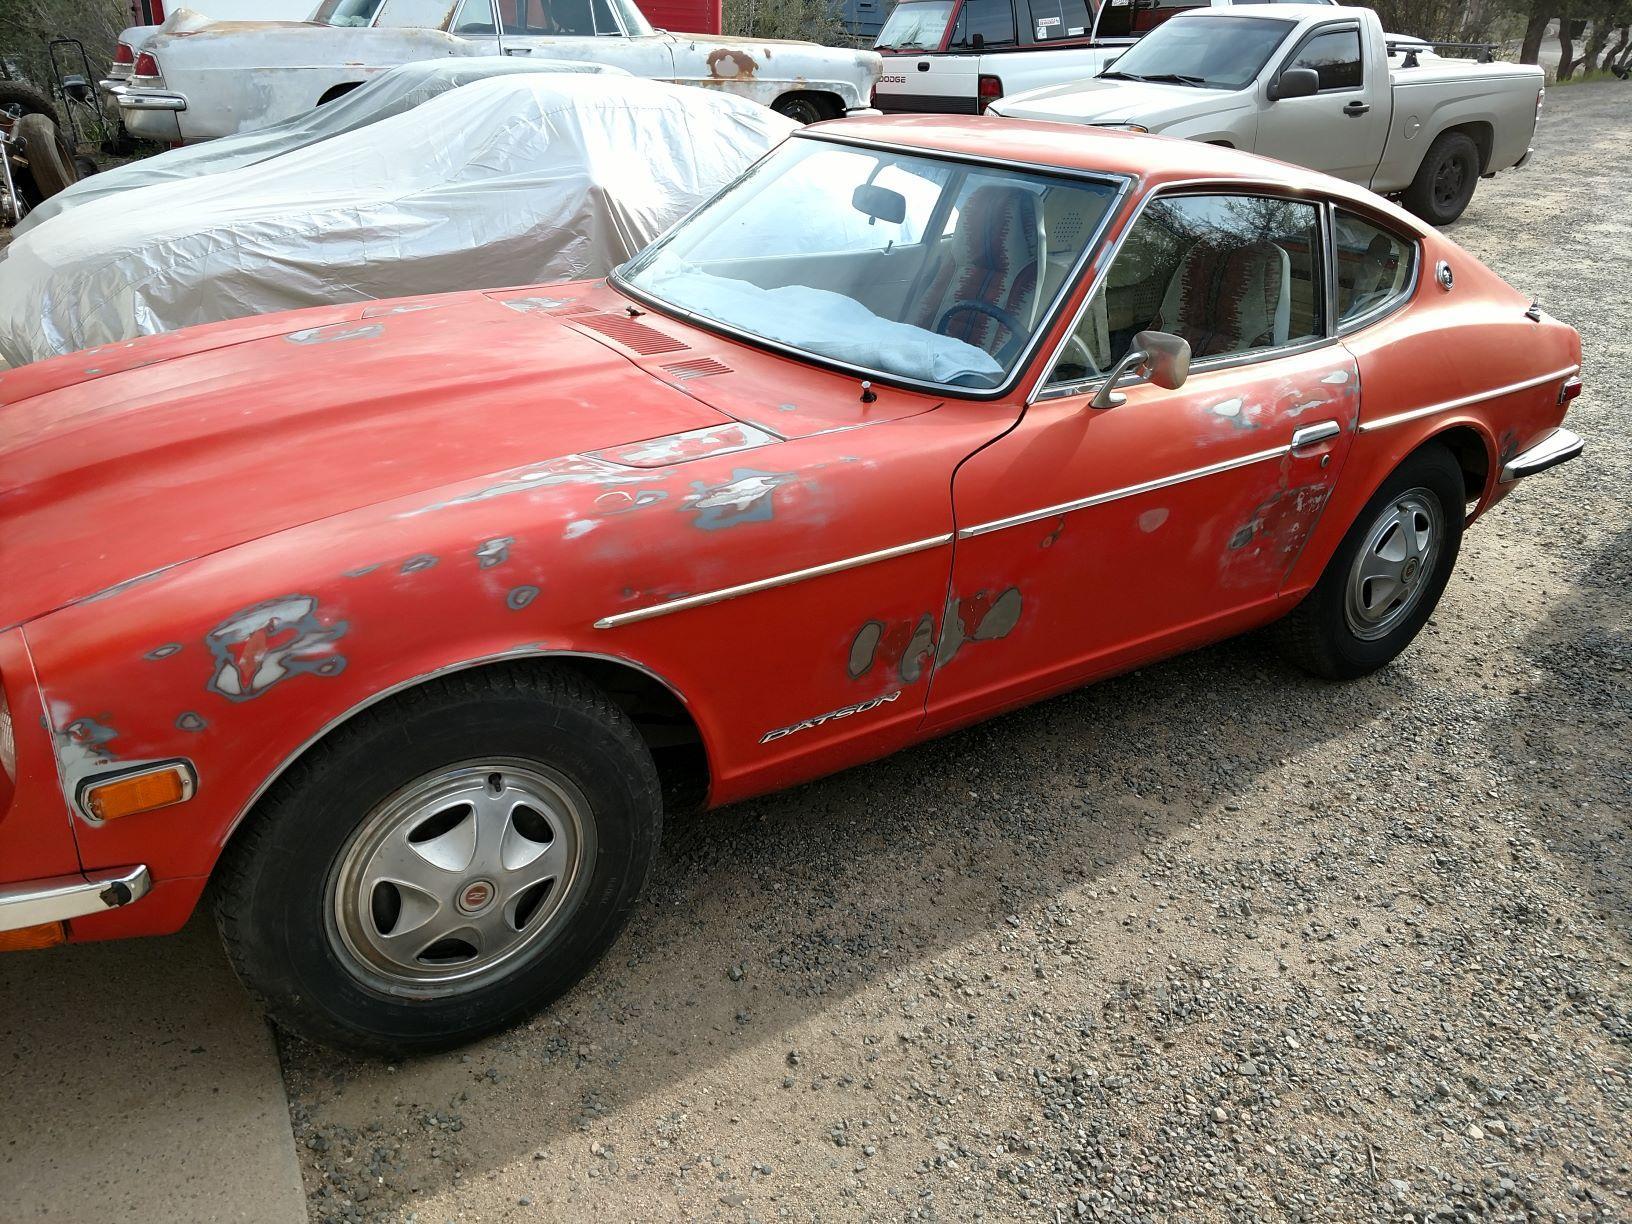 Original Rust Free 1972 240Z